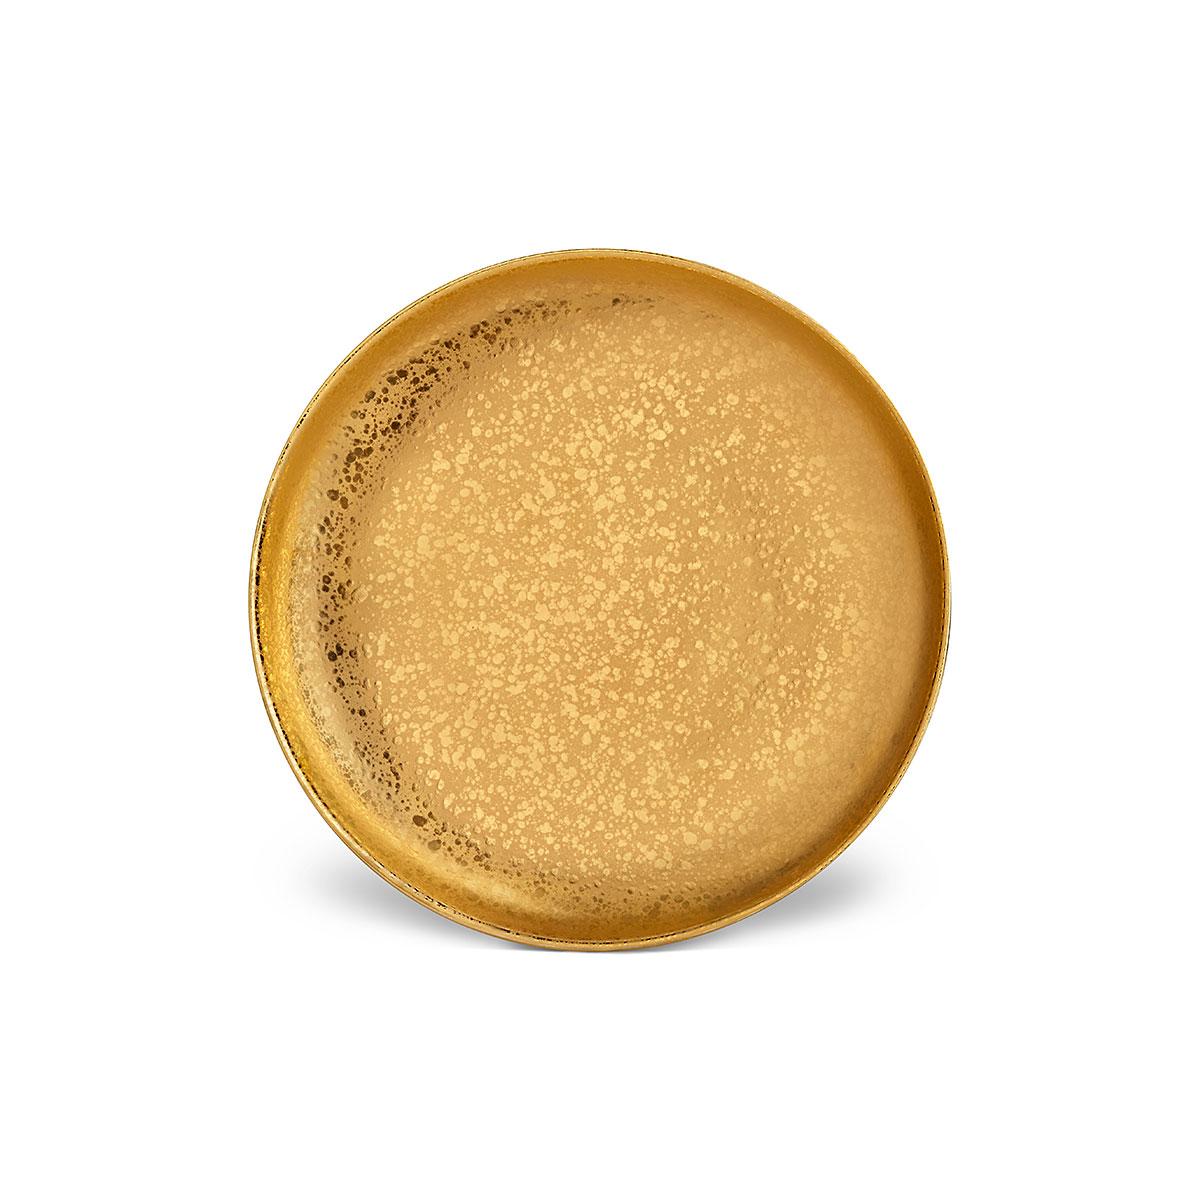 L'Objet I Alchimie Dinner Plate Gold